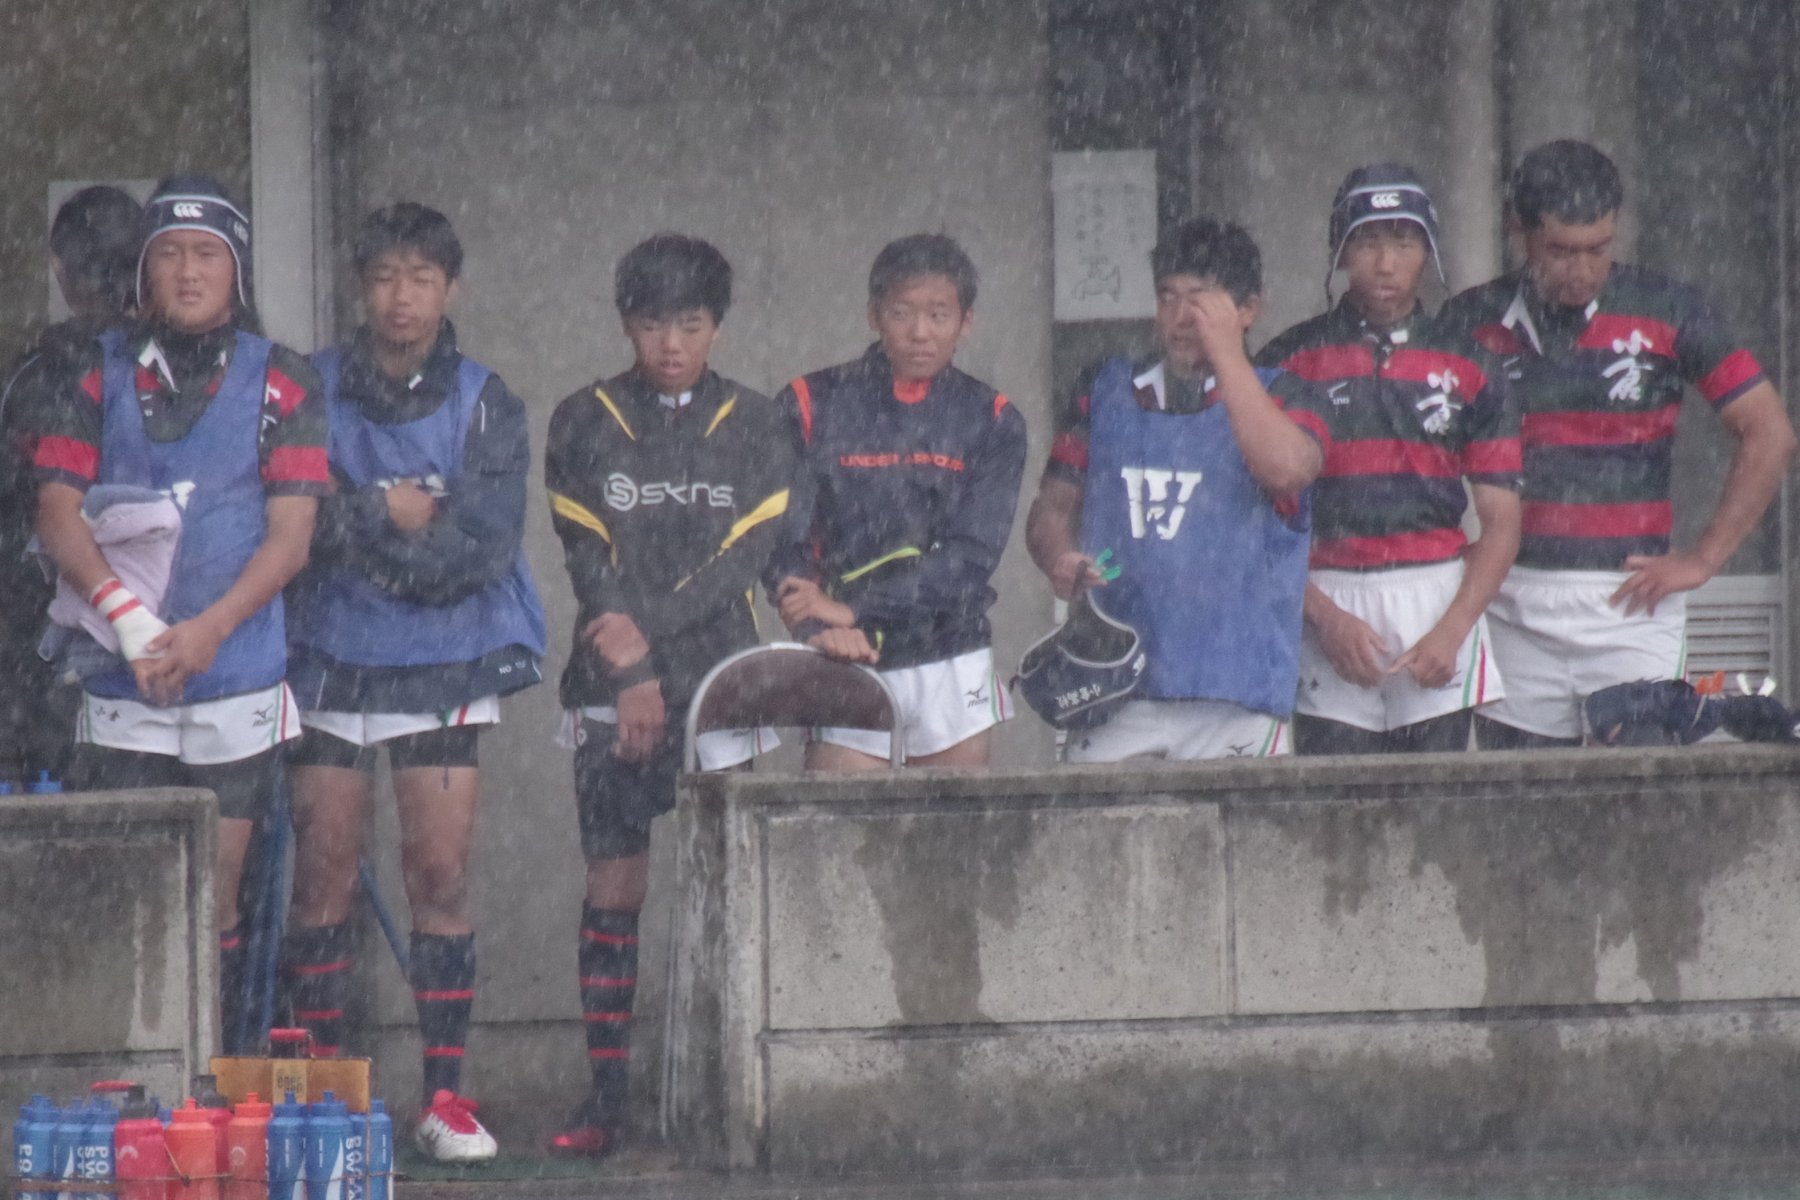 http://kokura-rugby.sakura.ne.jp/180513_135702_0247.jpg